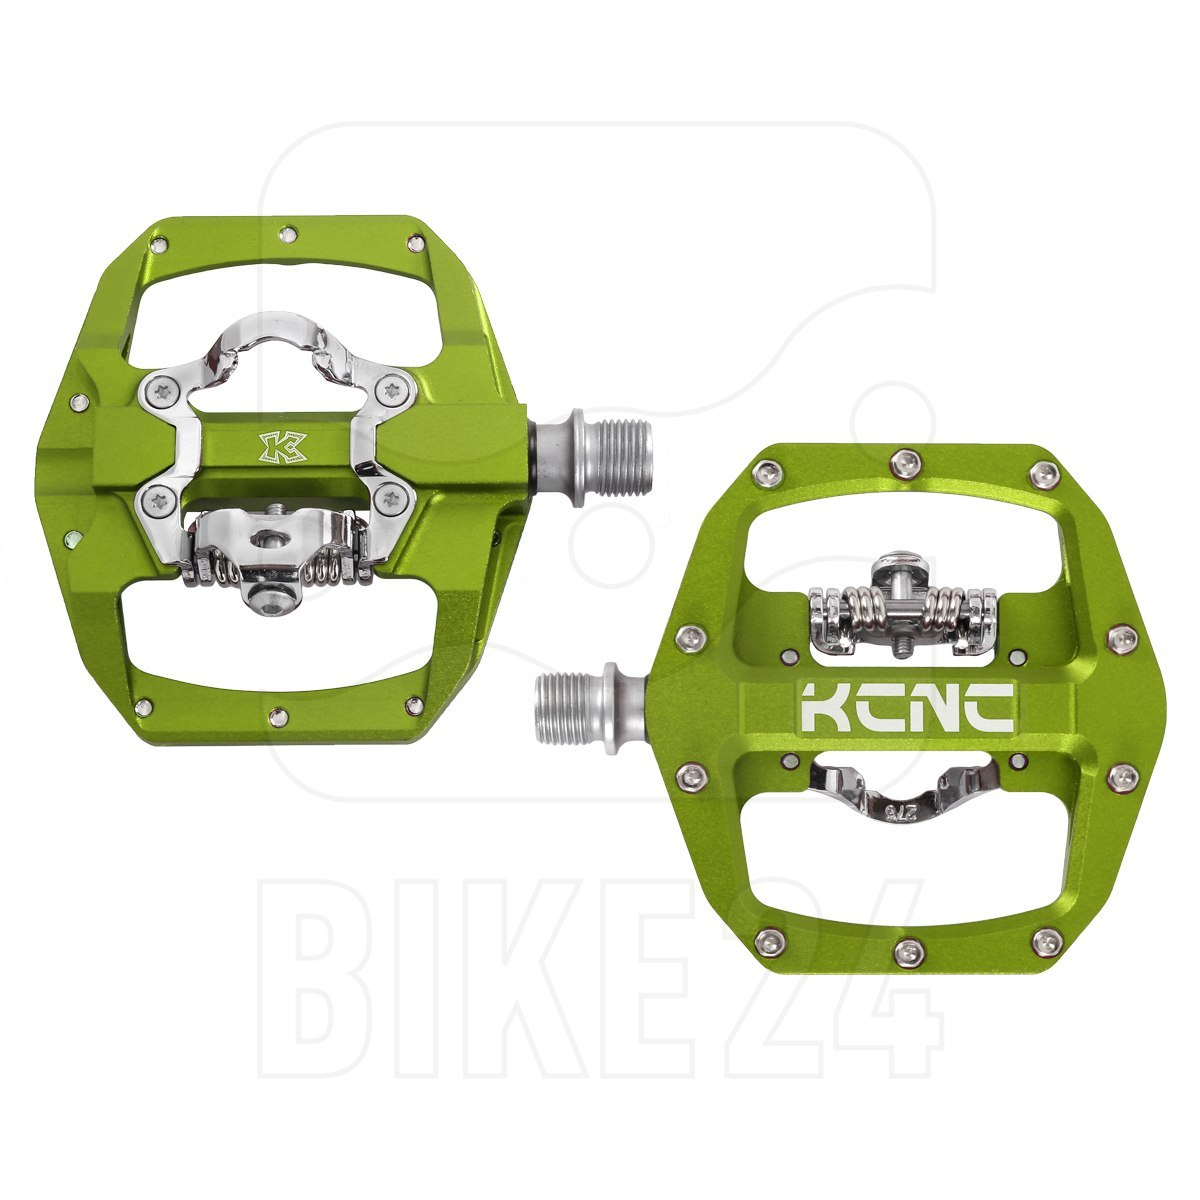 KCNC FR TRAP Clipless Pedal mit Stahlachse - gelb-grün